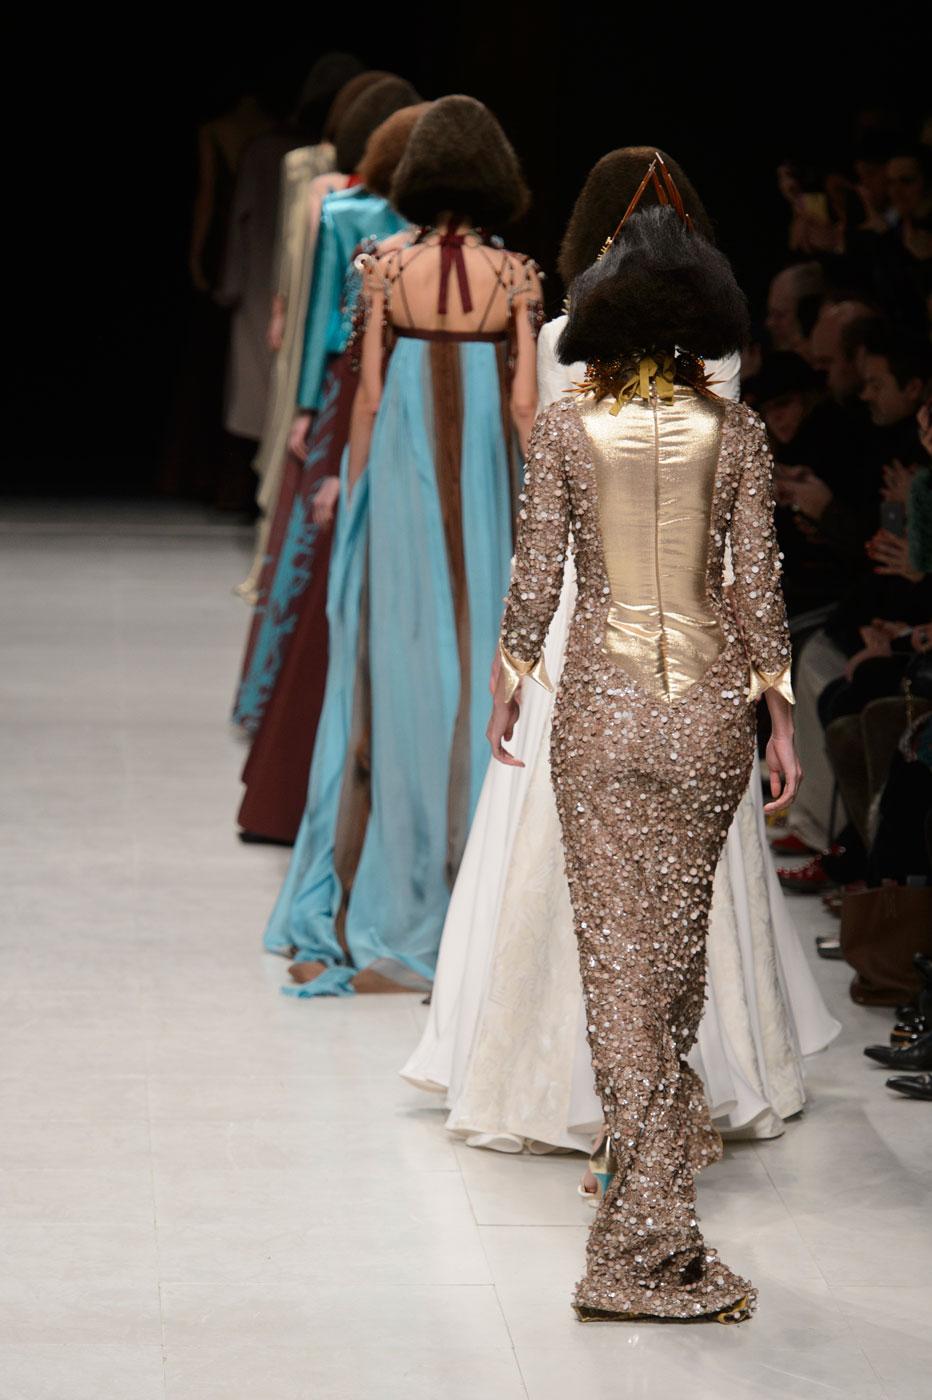 Julien-Fournie-Prive-fashion-runway-show-haute-couture-paris-spring-2015-the-impression-61